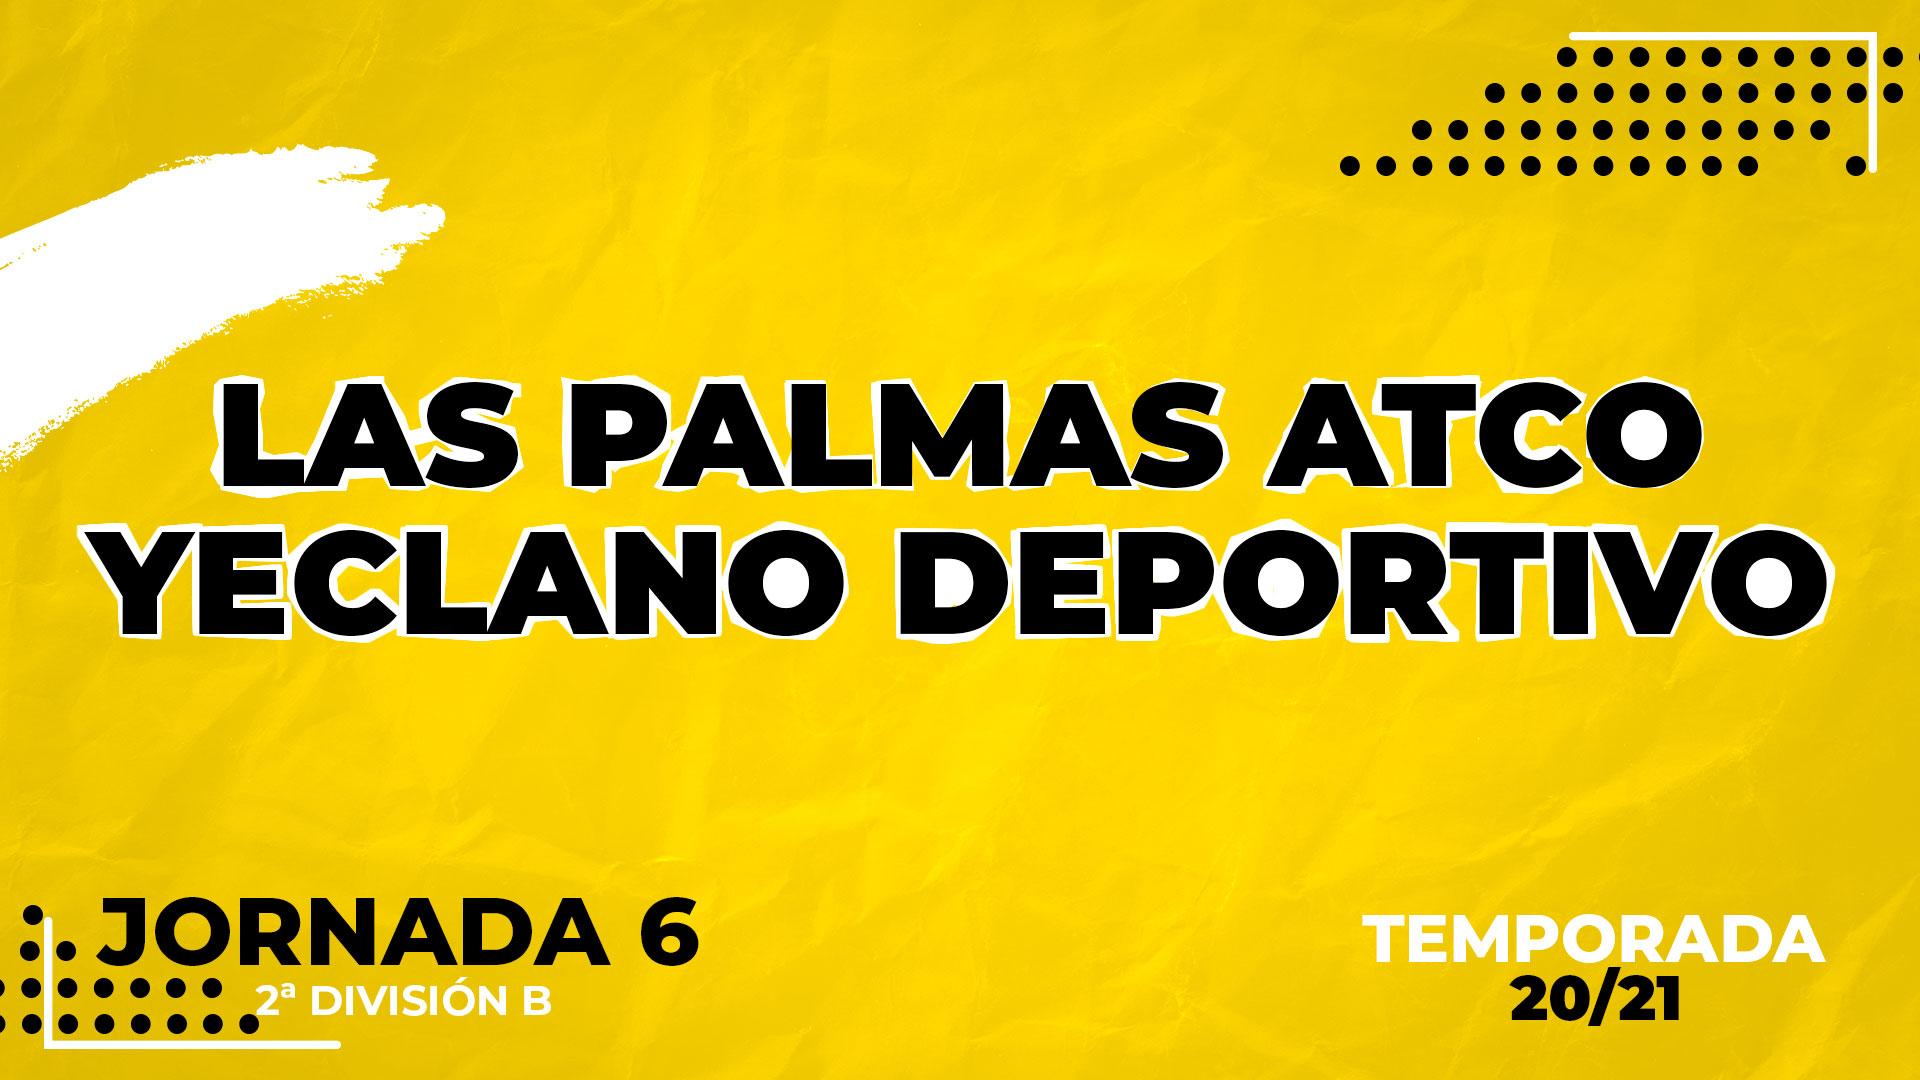 Las Palmas Atlético vs Yeclano